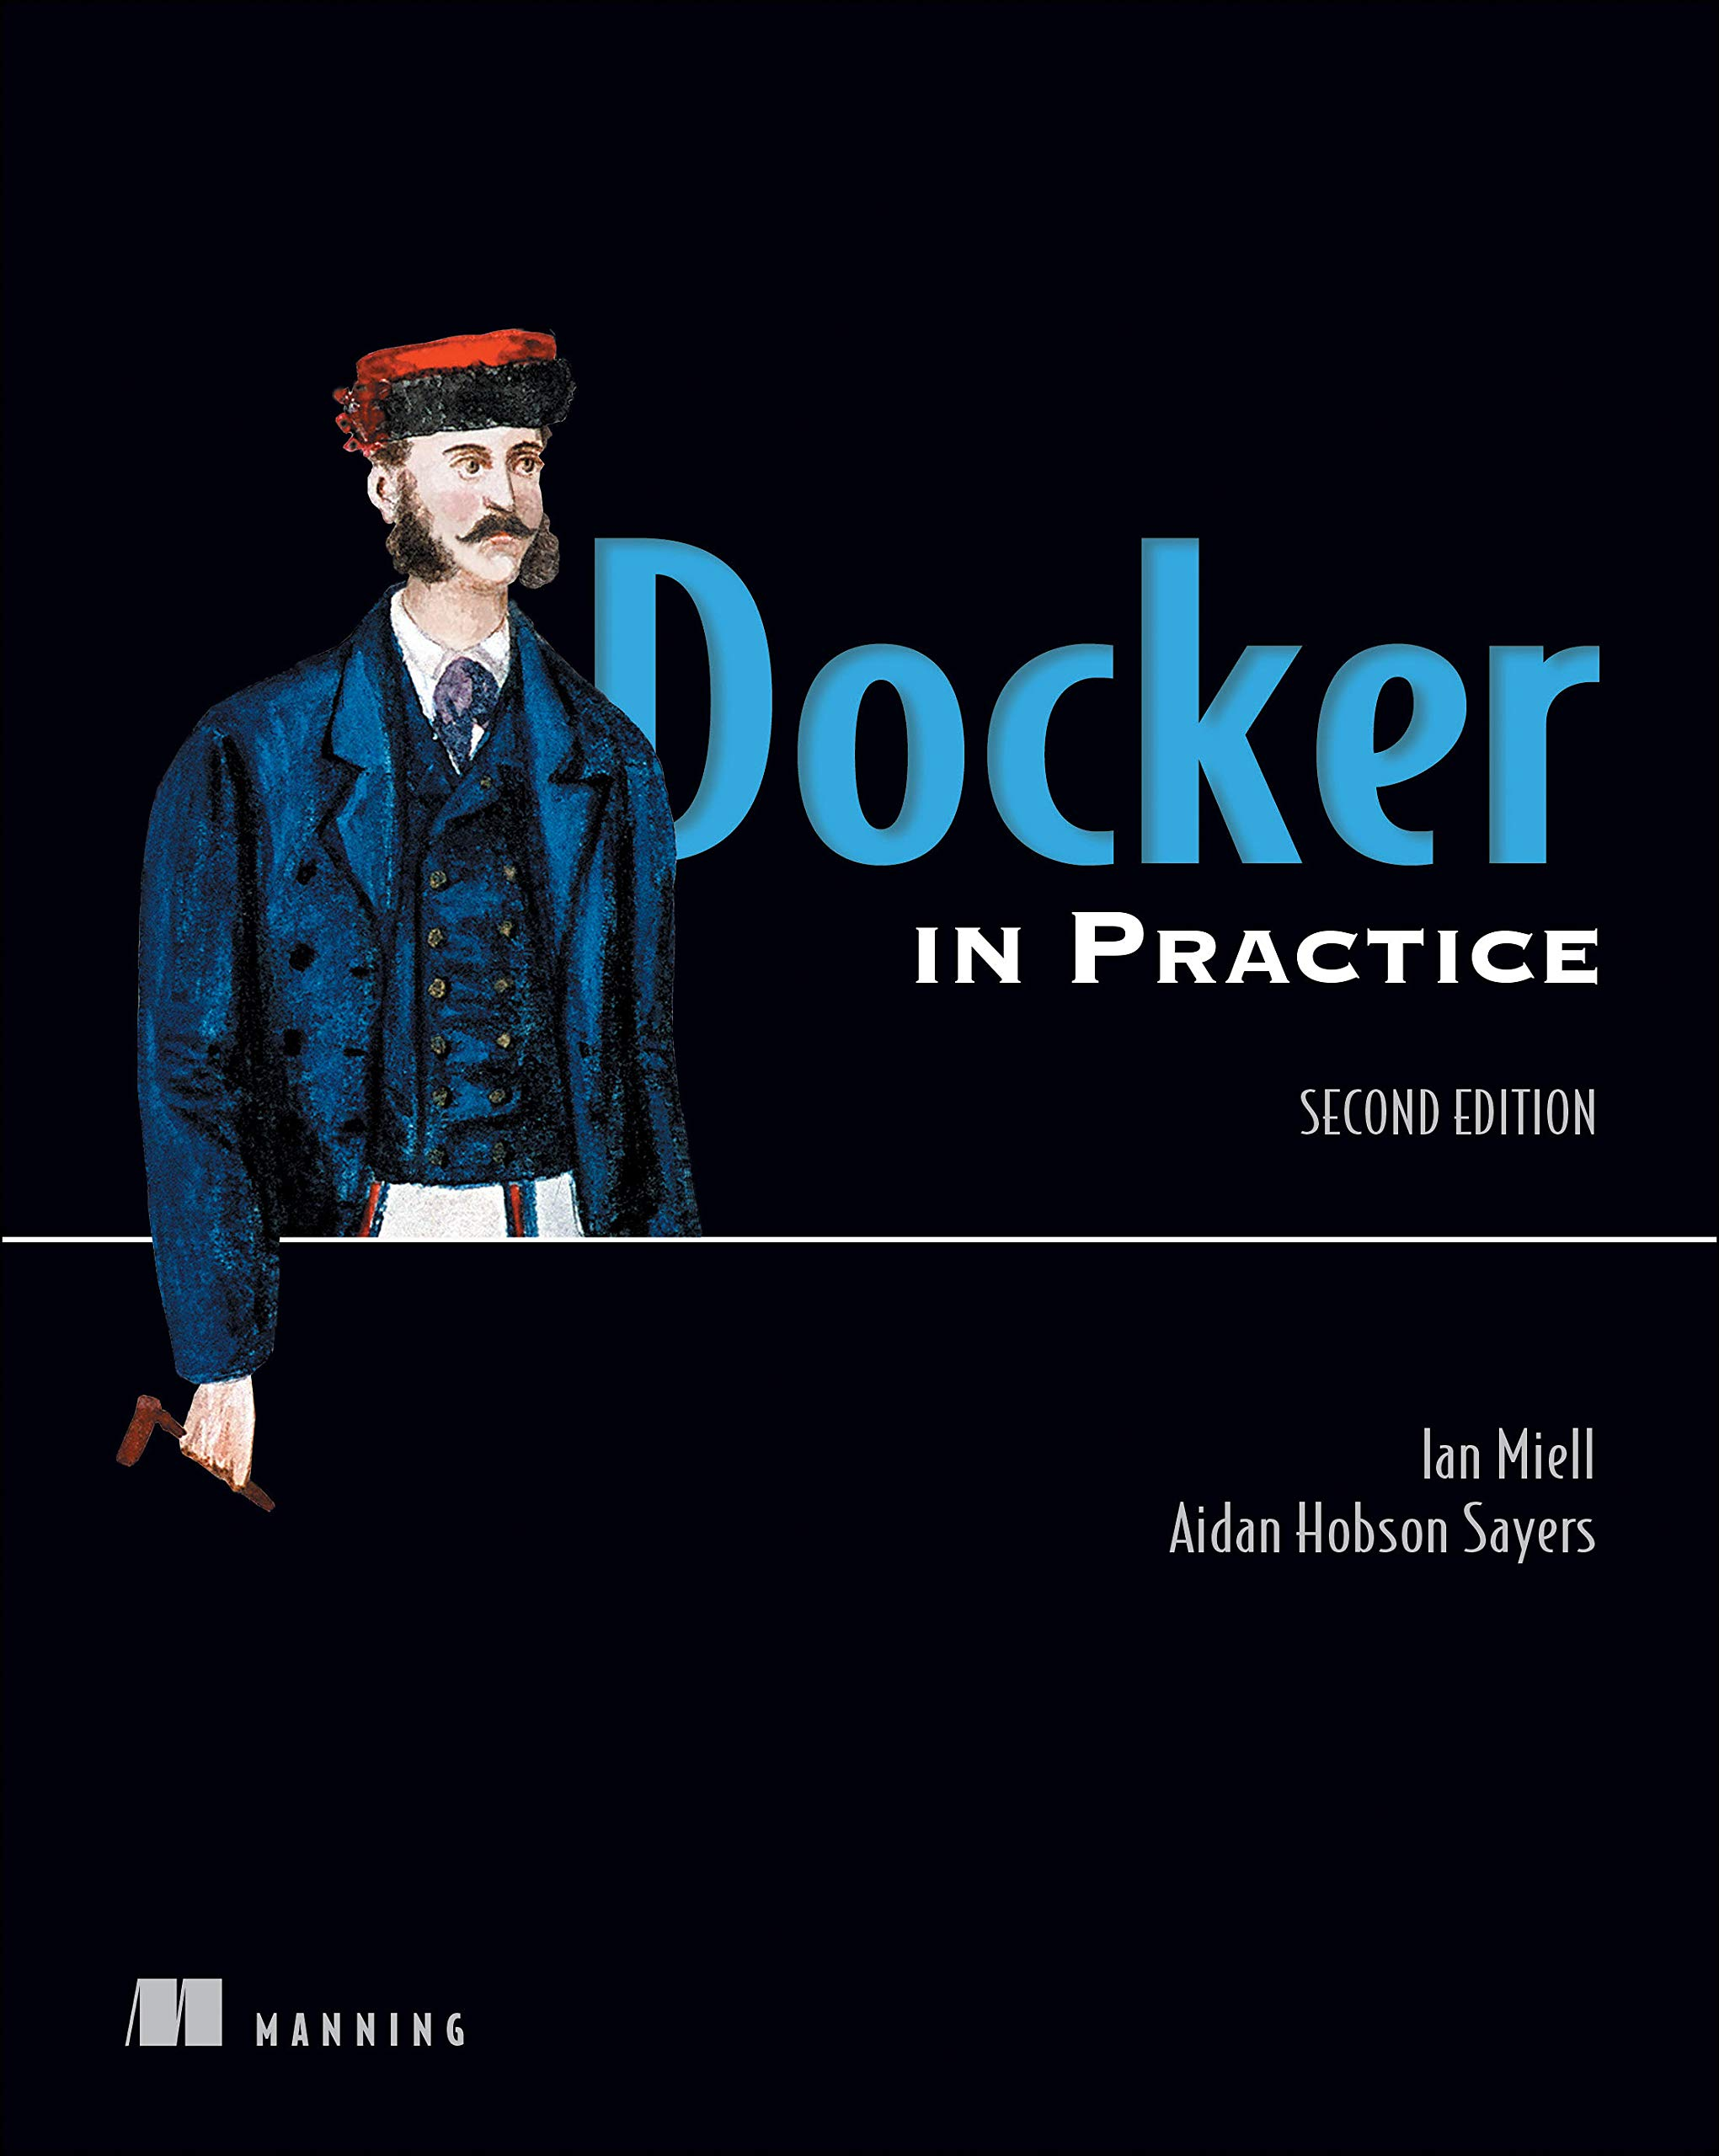 Docker in Action, Second Edition por Ian Miell